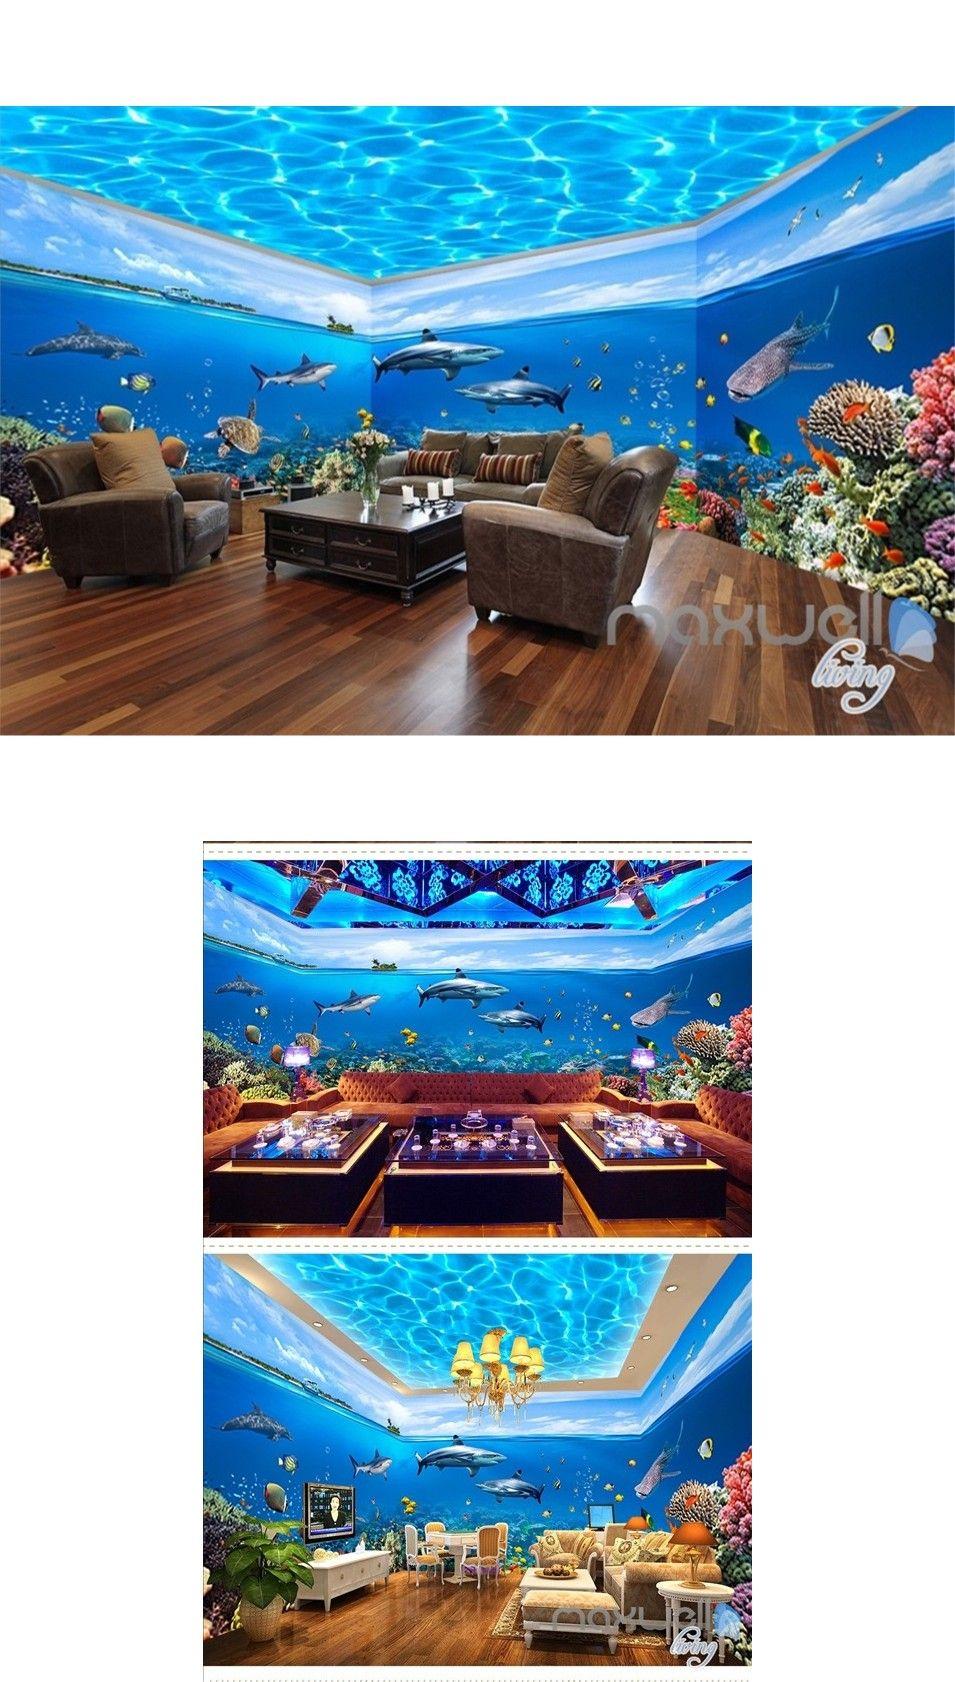 Fish tank ocean park theme space entire room wallpaper wall mural decal IDCQW-000012